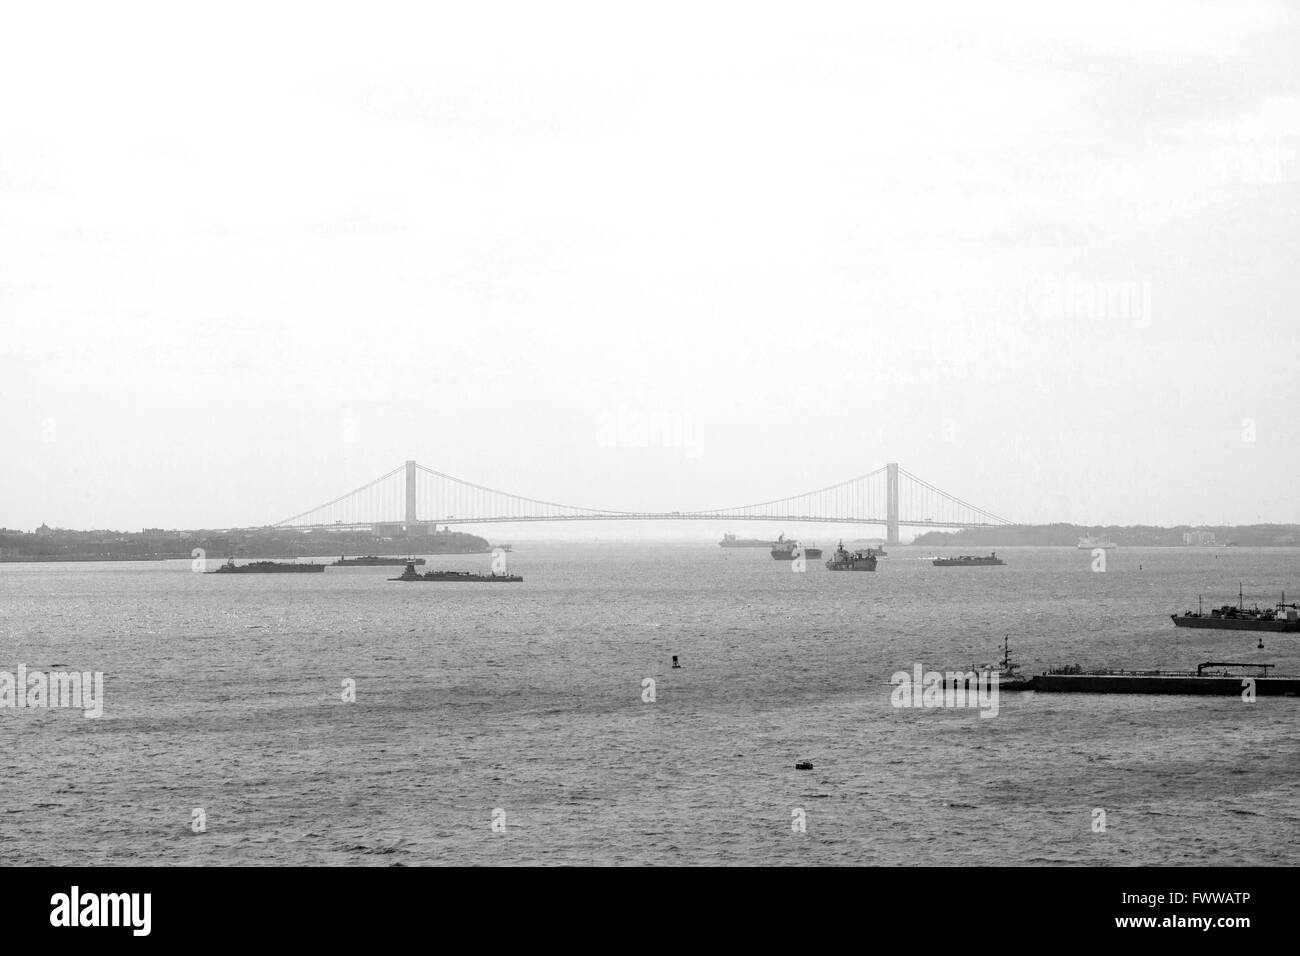 Verrazano-Narrows Bridge, New York, États-Unis d'Amérique. Banque D'Images